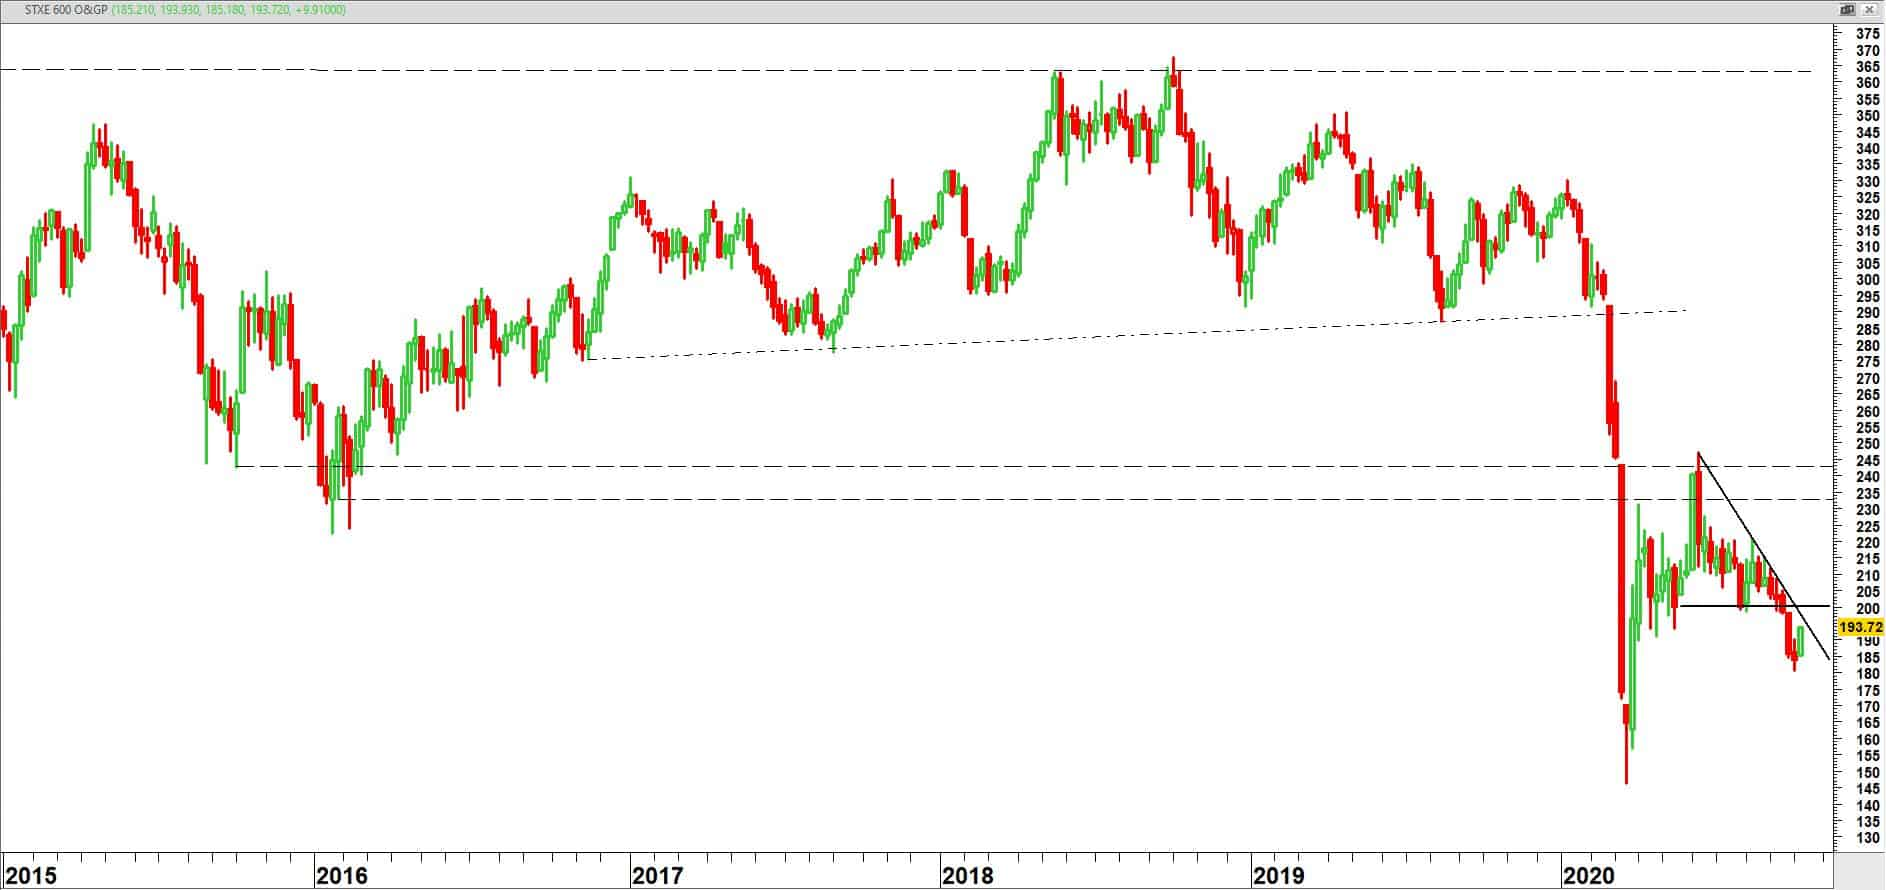 DJ Stoxx Europe 600 Oil & Gas Index (SXEP) op weekbasis vanaf 2015